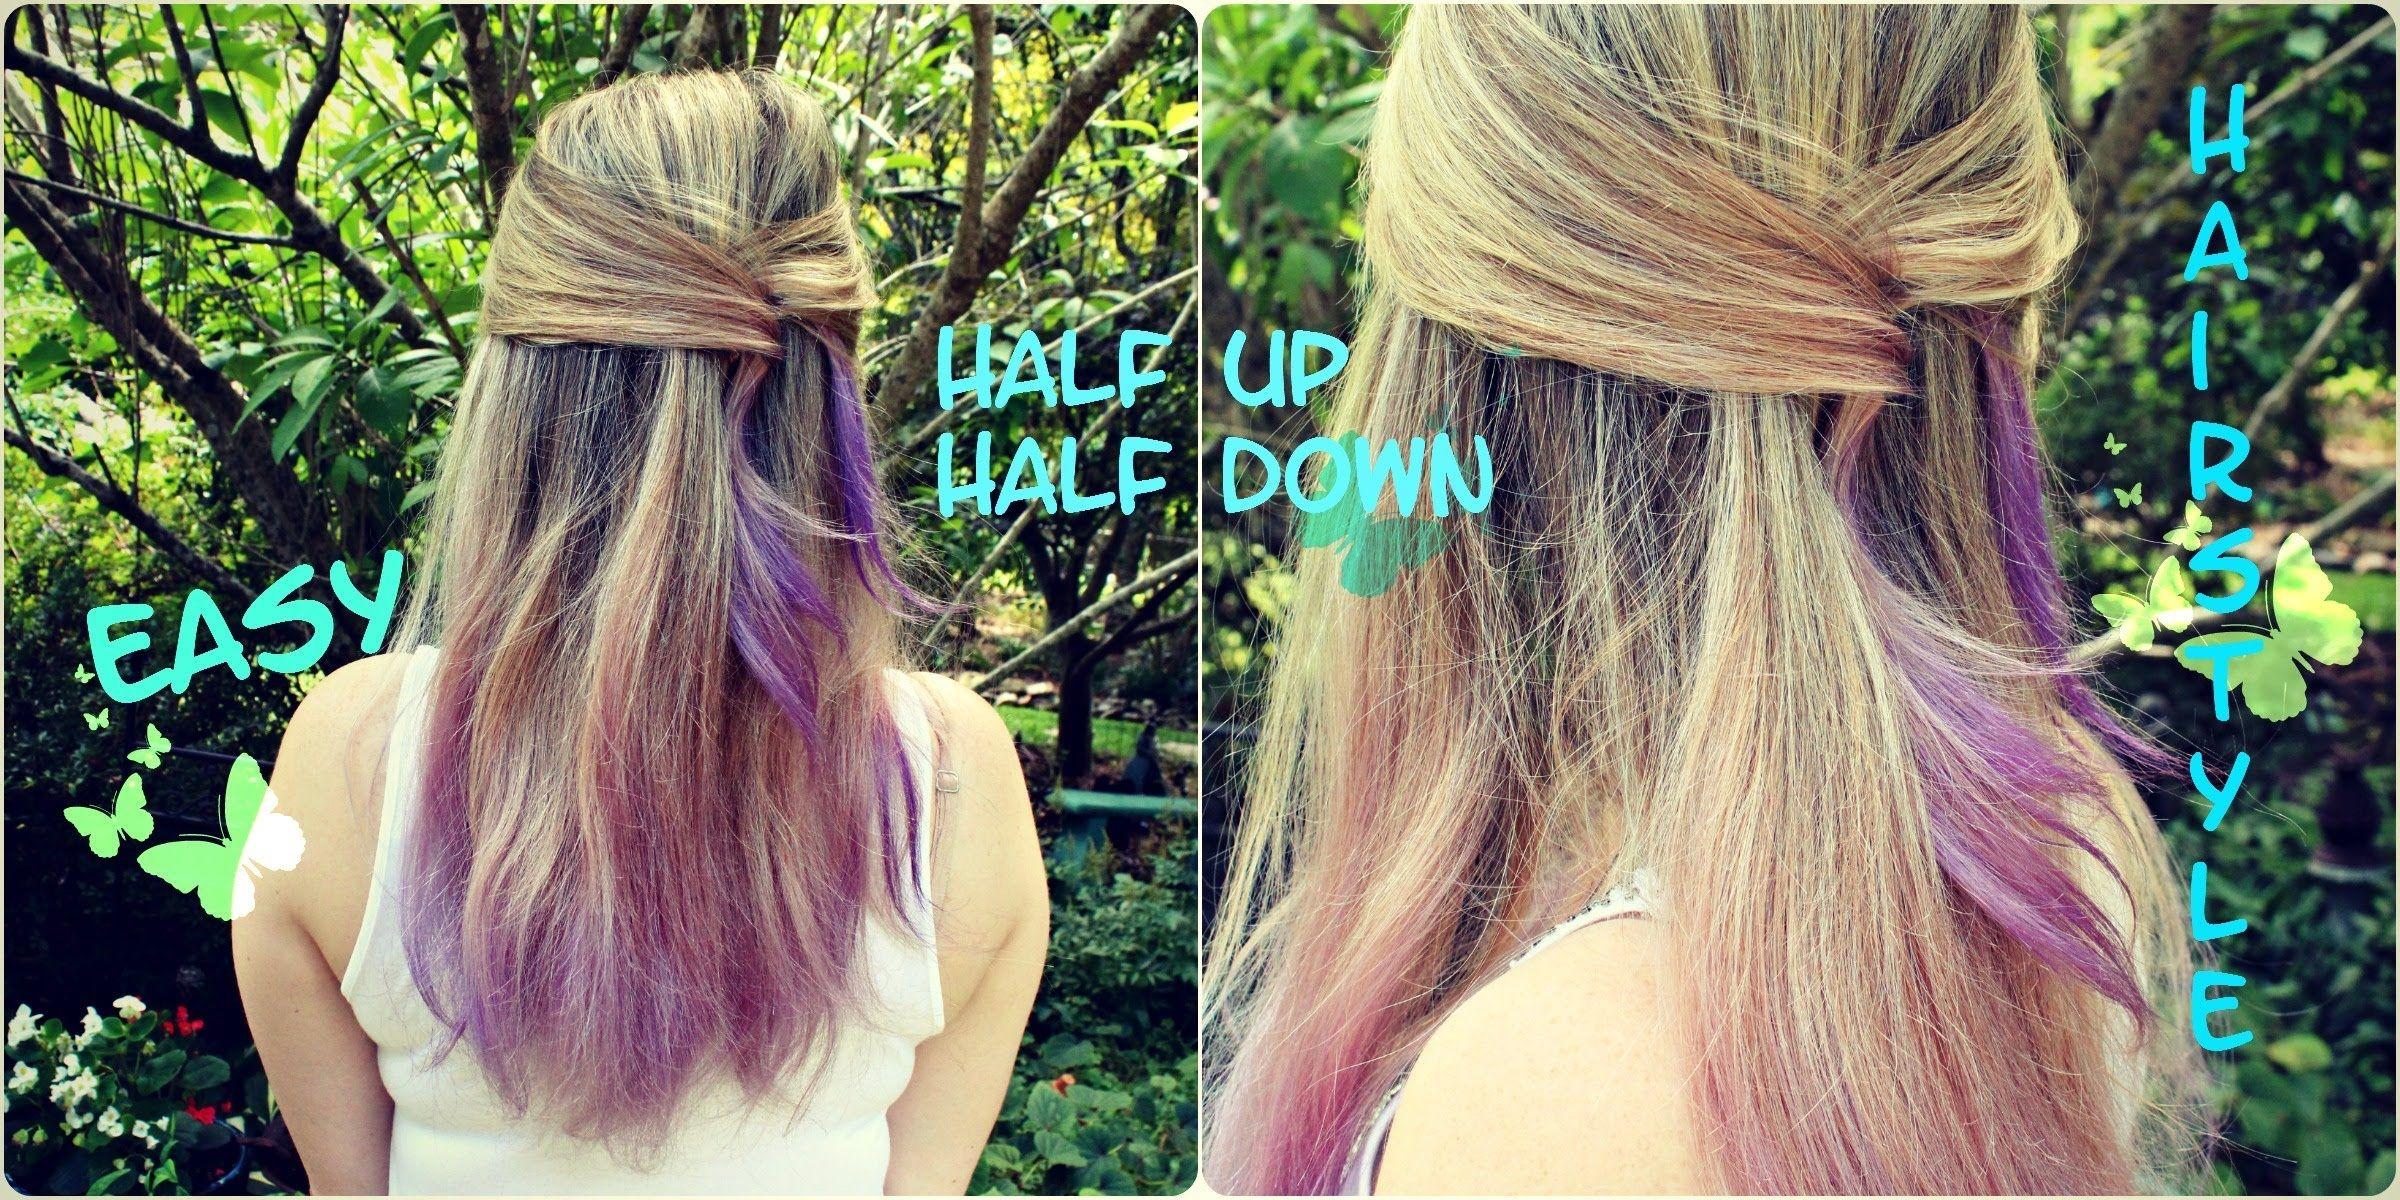 Easy diy hairstyle perfect for shoulder length medium or long hair